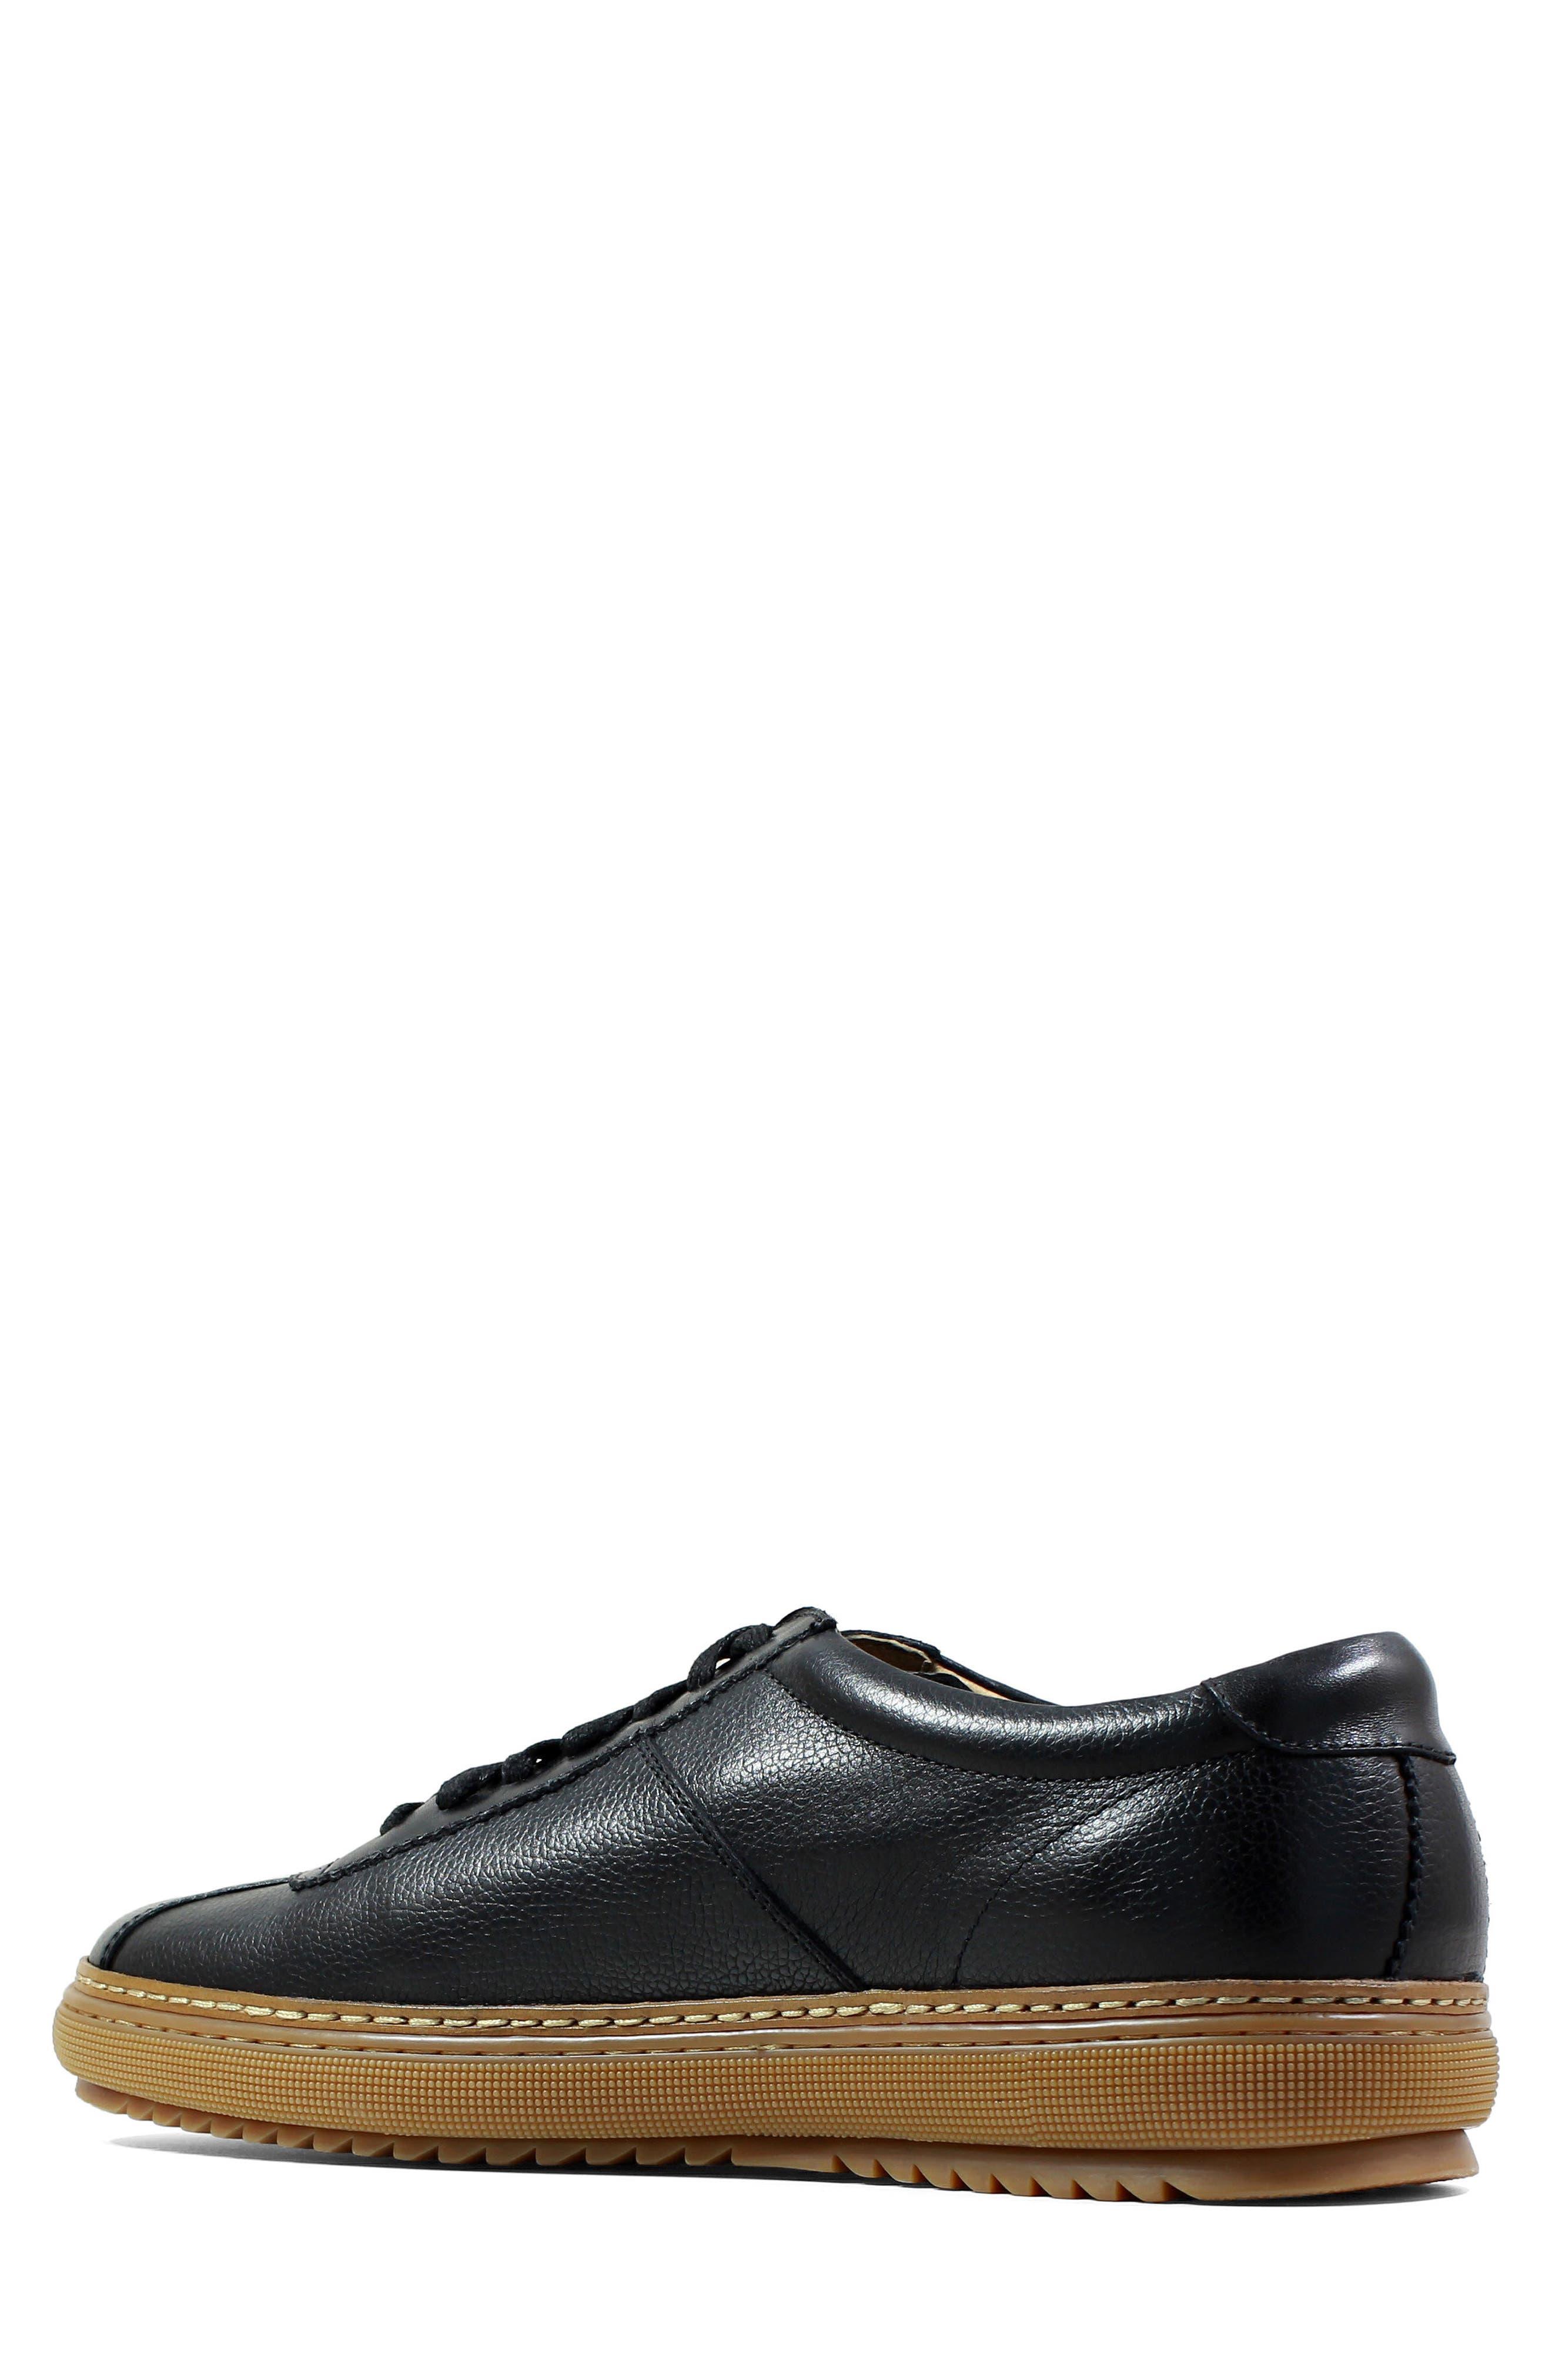 Crew Sneaker,                             Alternate thumbnail 2, color,                             Black